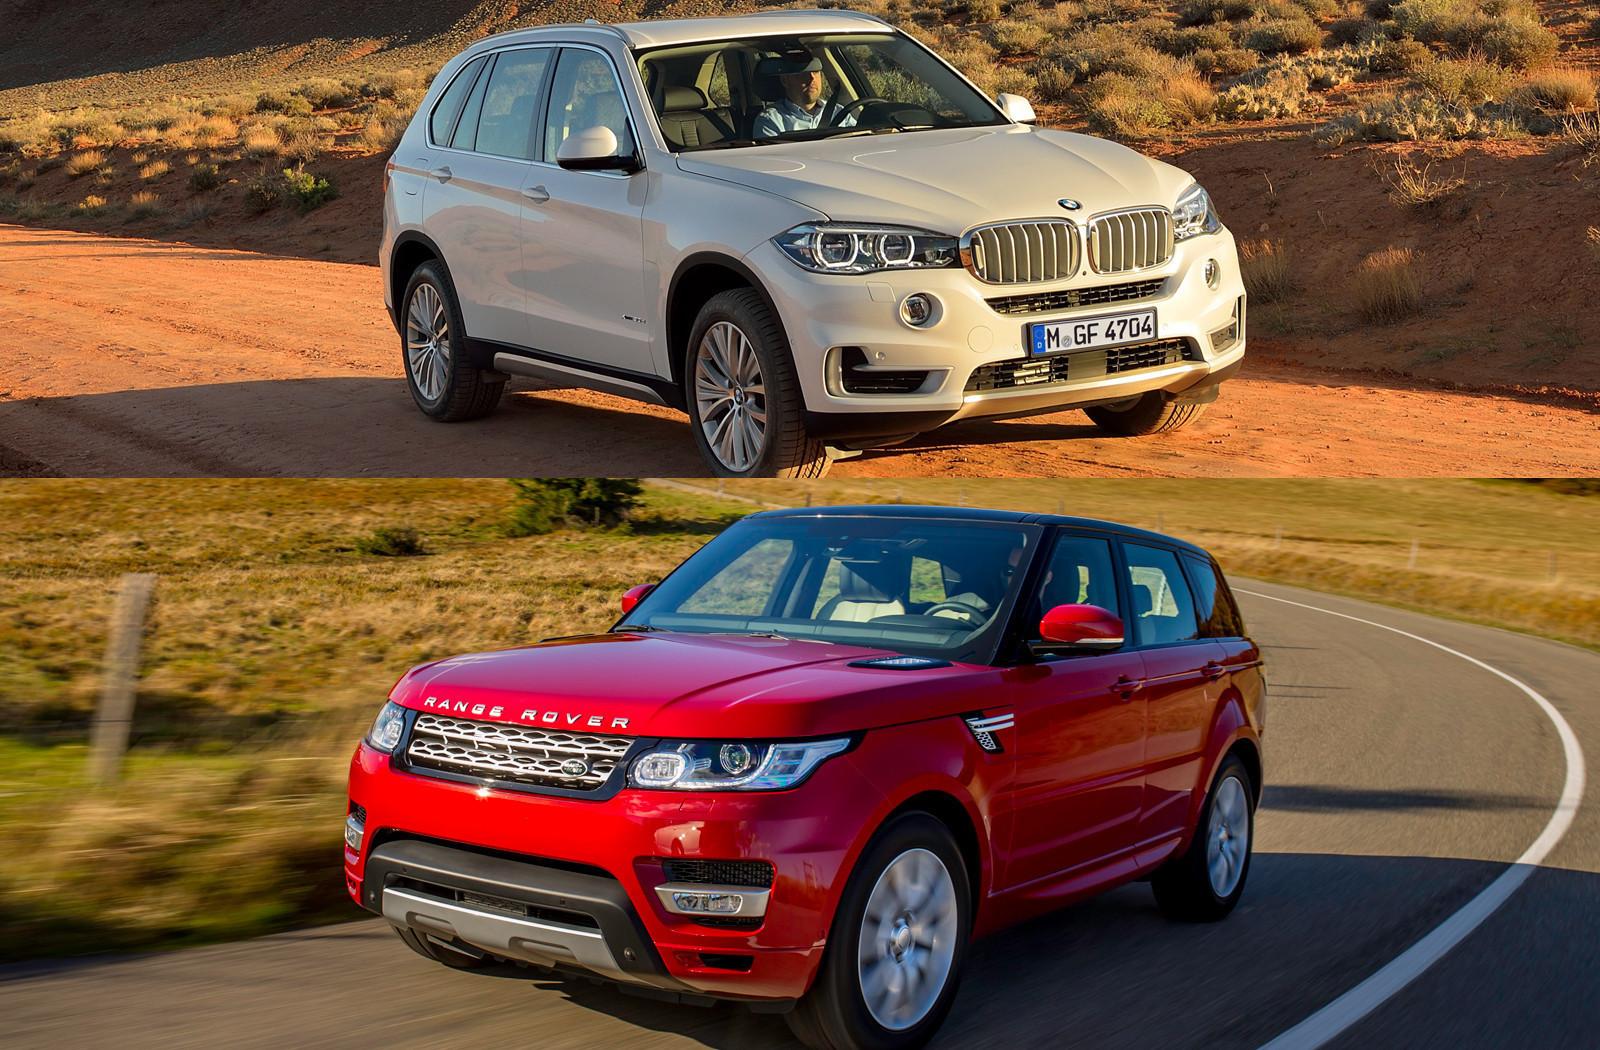 Best 2014 Luxury Midsize SUVs • SUV blog |Best Mid Size Luxury Suv 2014